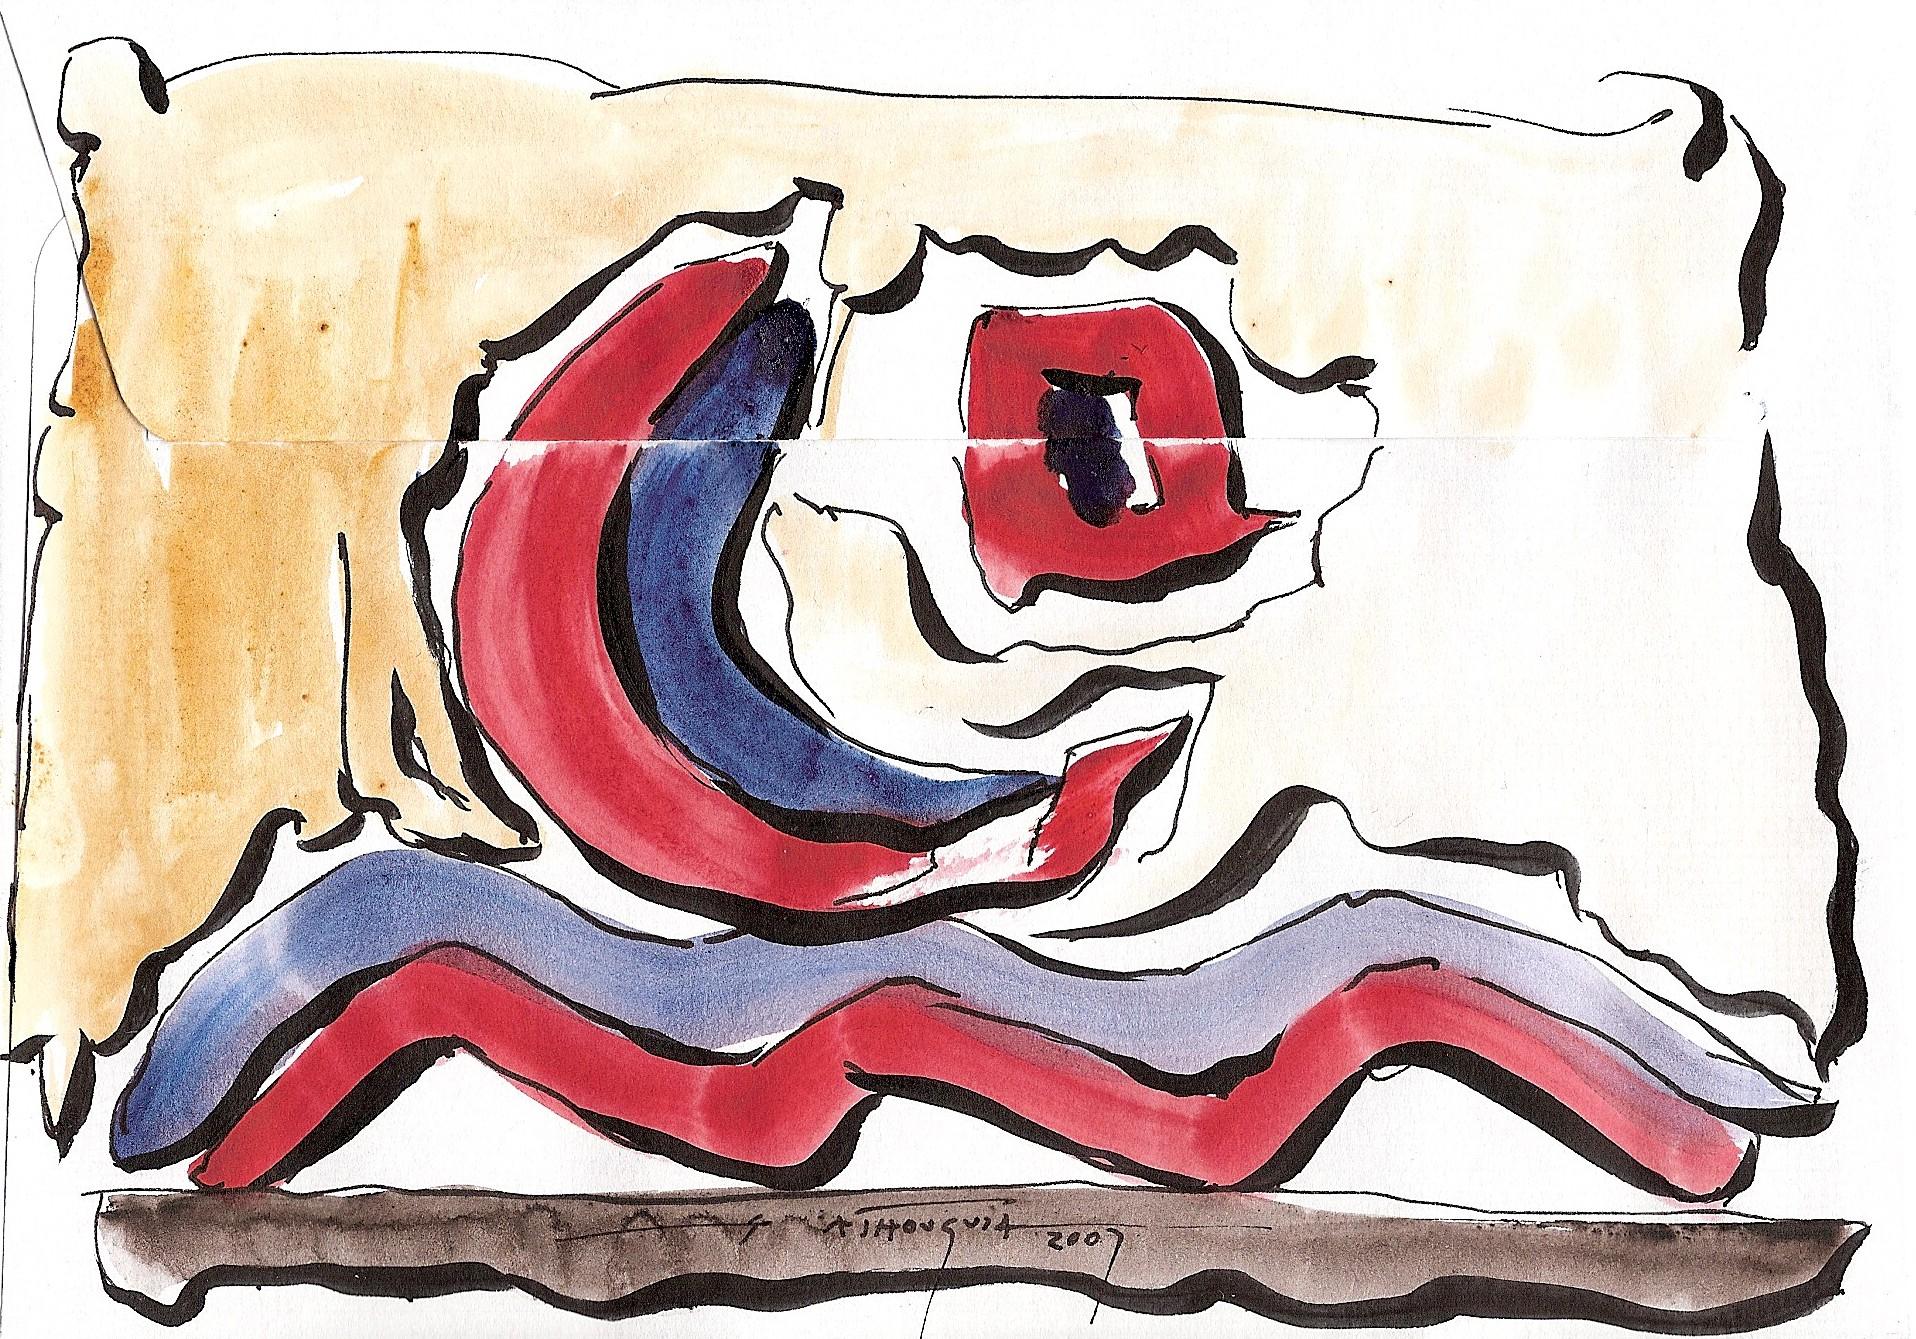 Cartas cheias envelope - encontro artistas Sintra 2007.jpg